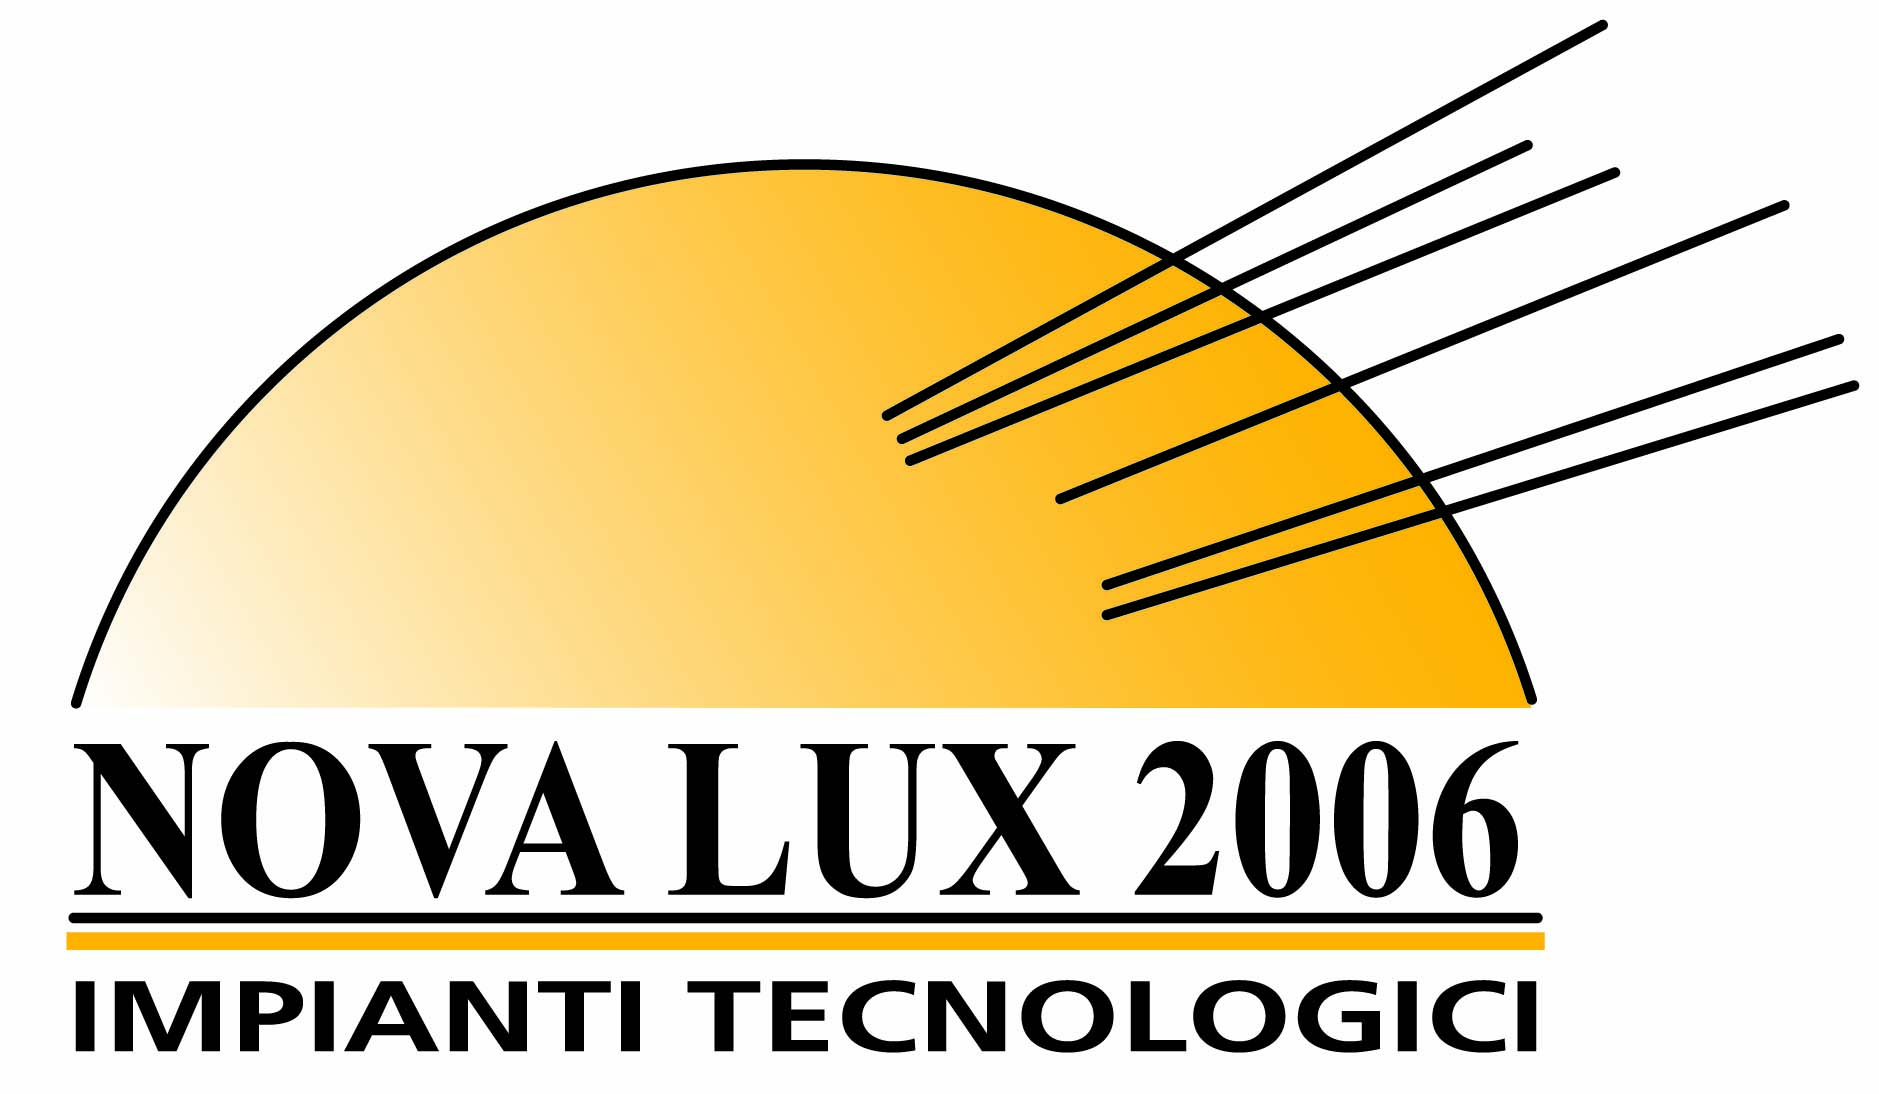 Novalux 2006